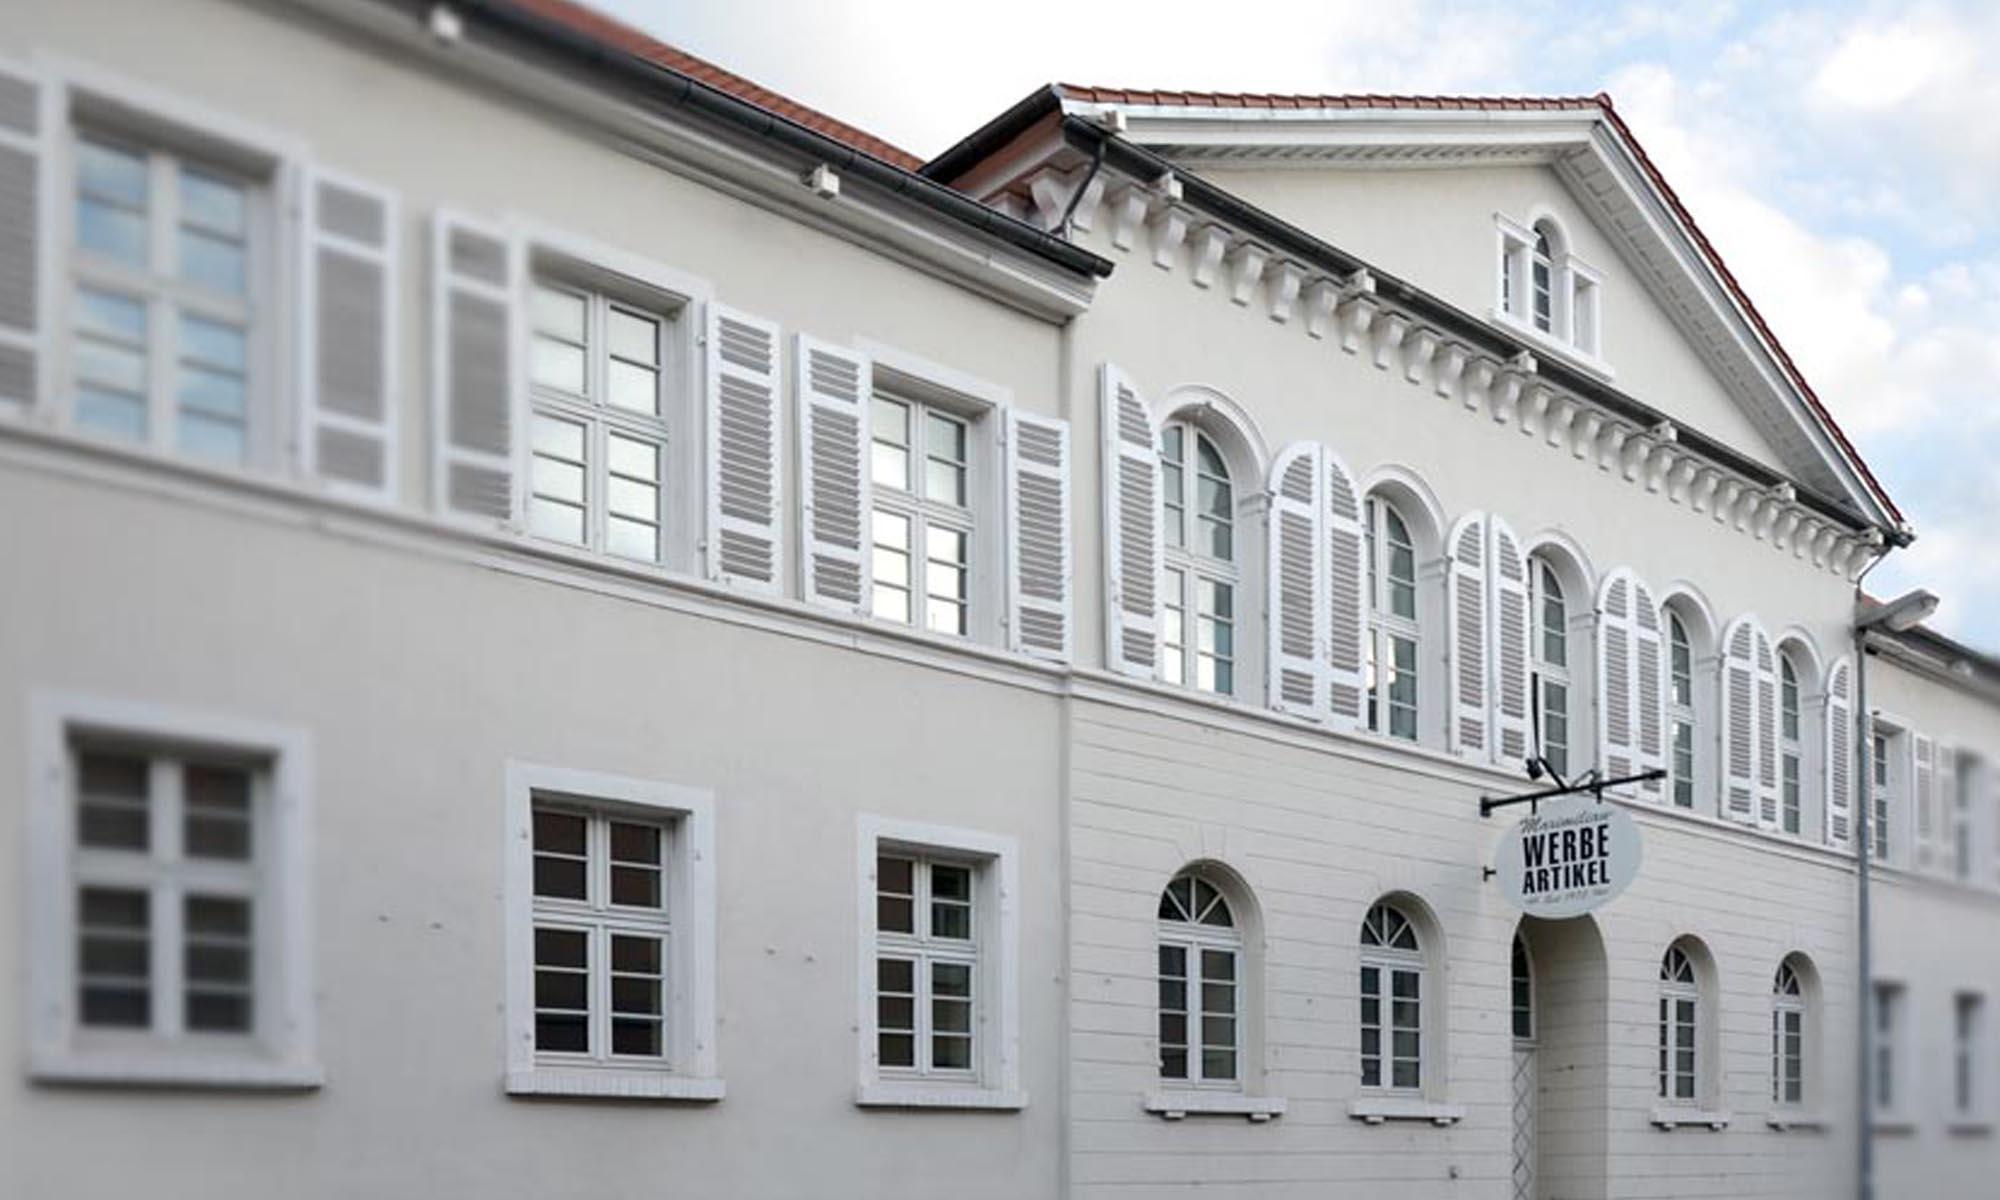 MAXIMILIAN-Werbeartikel-GebäudeMAXIMILIAN-Werbeartikel-Gebäude